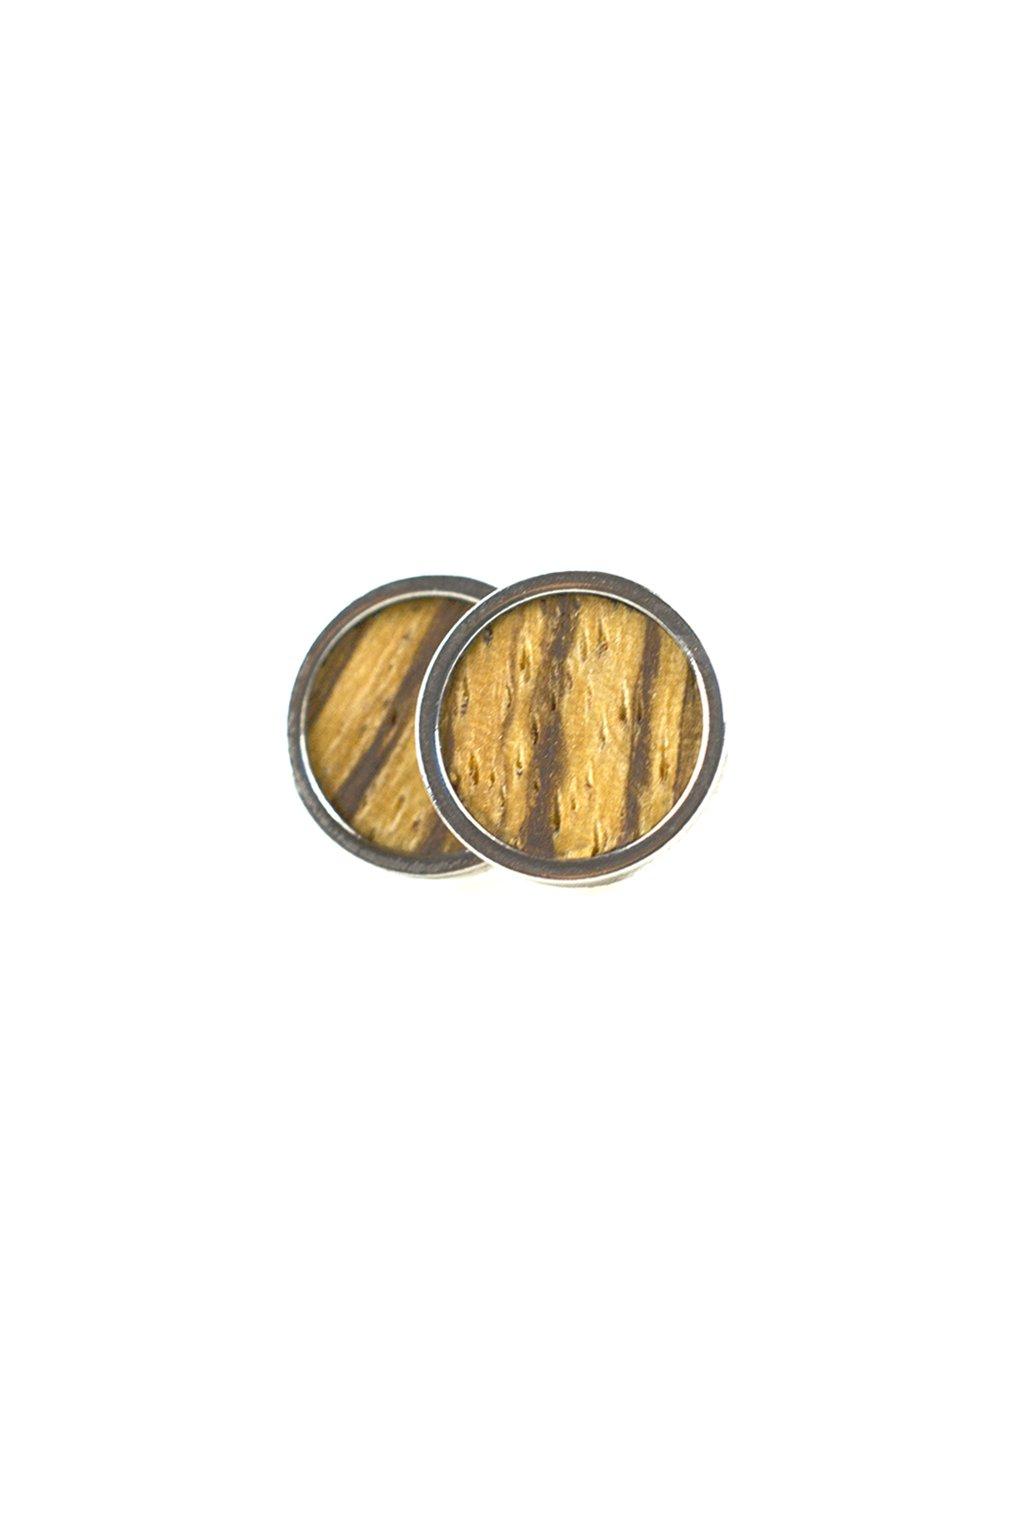 Dřevěné náušnice Astronium | JAA∞TY